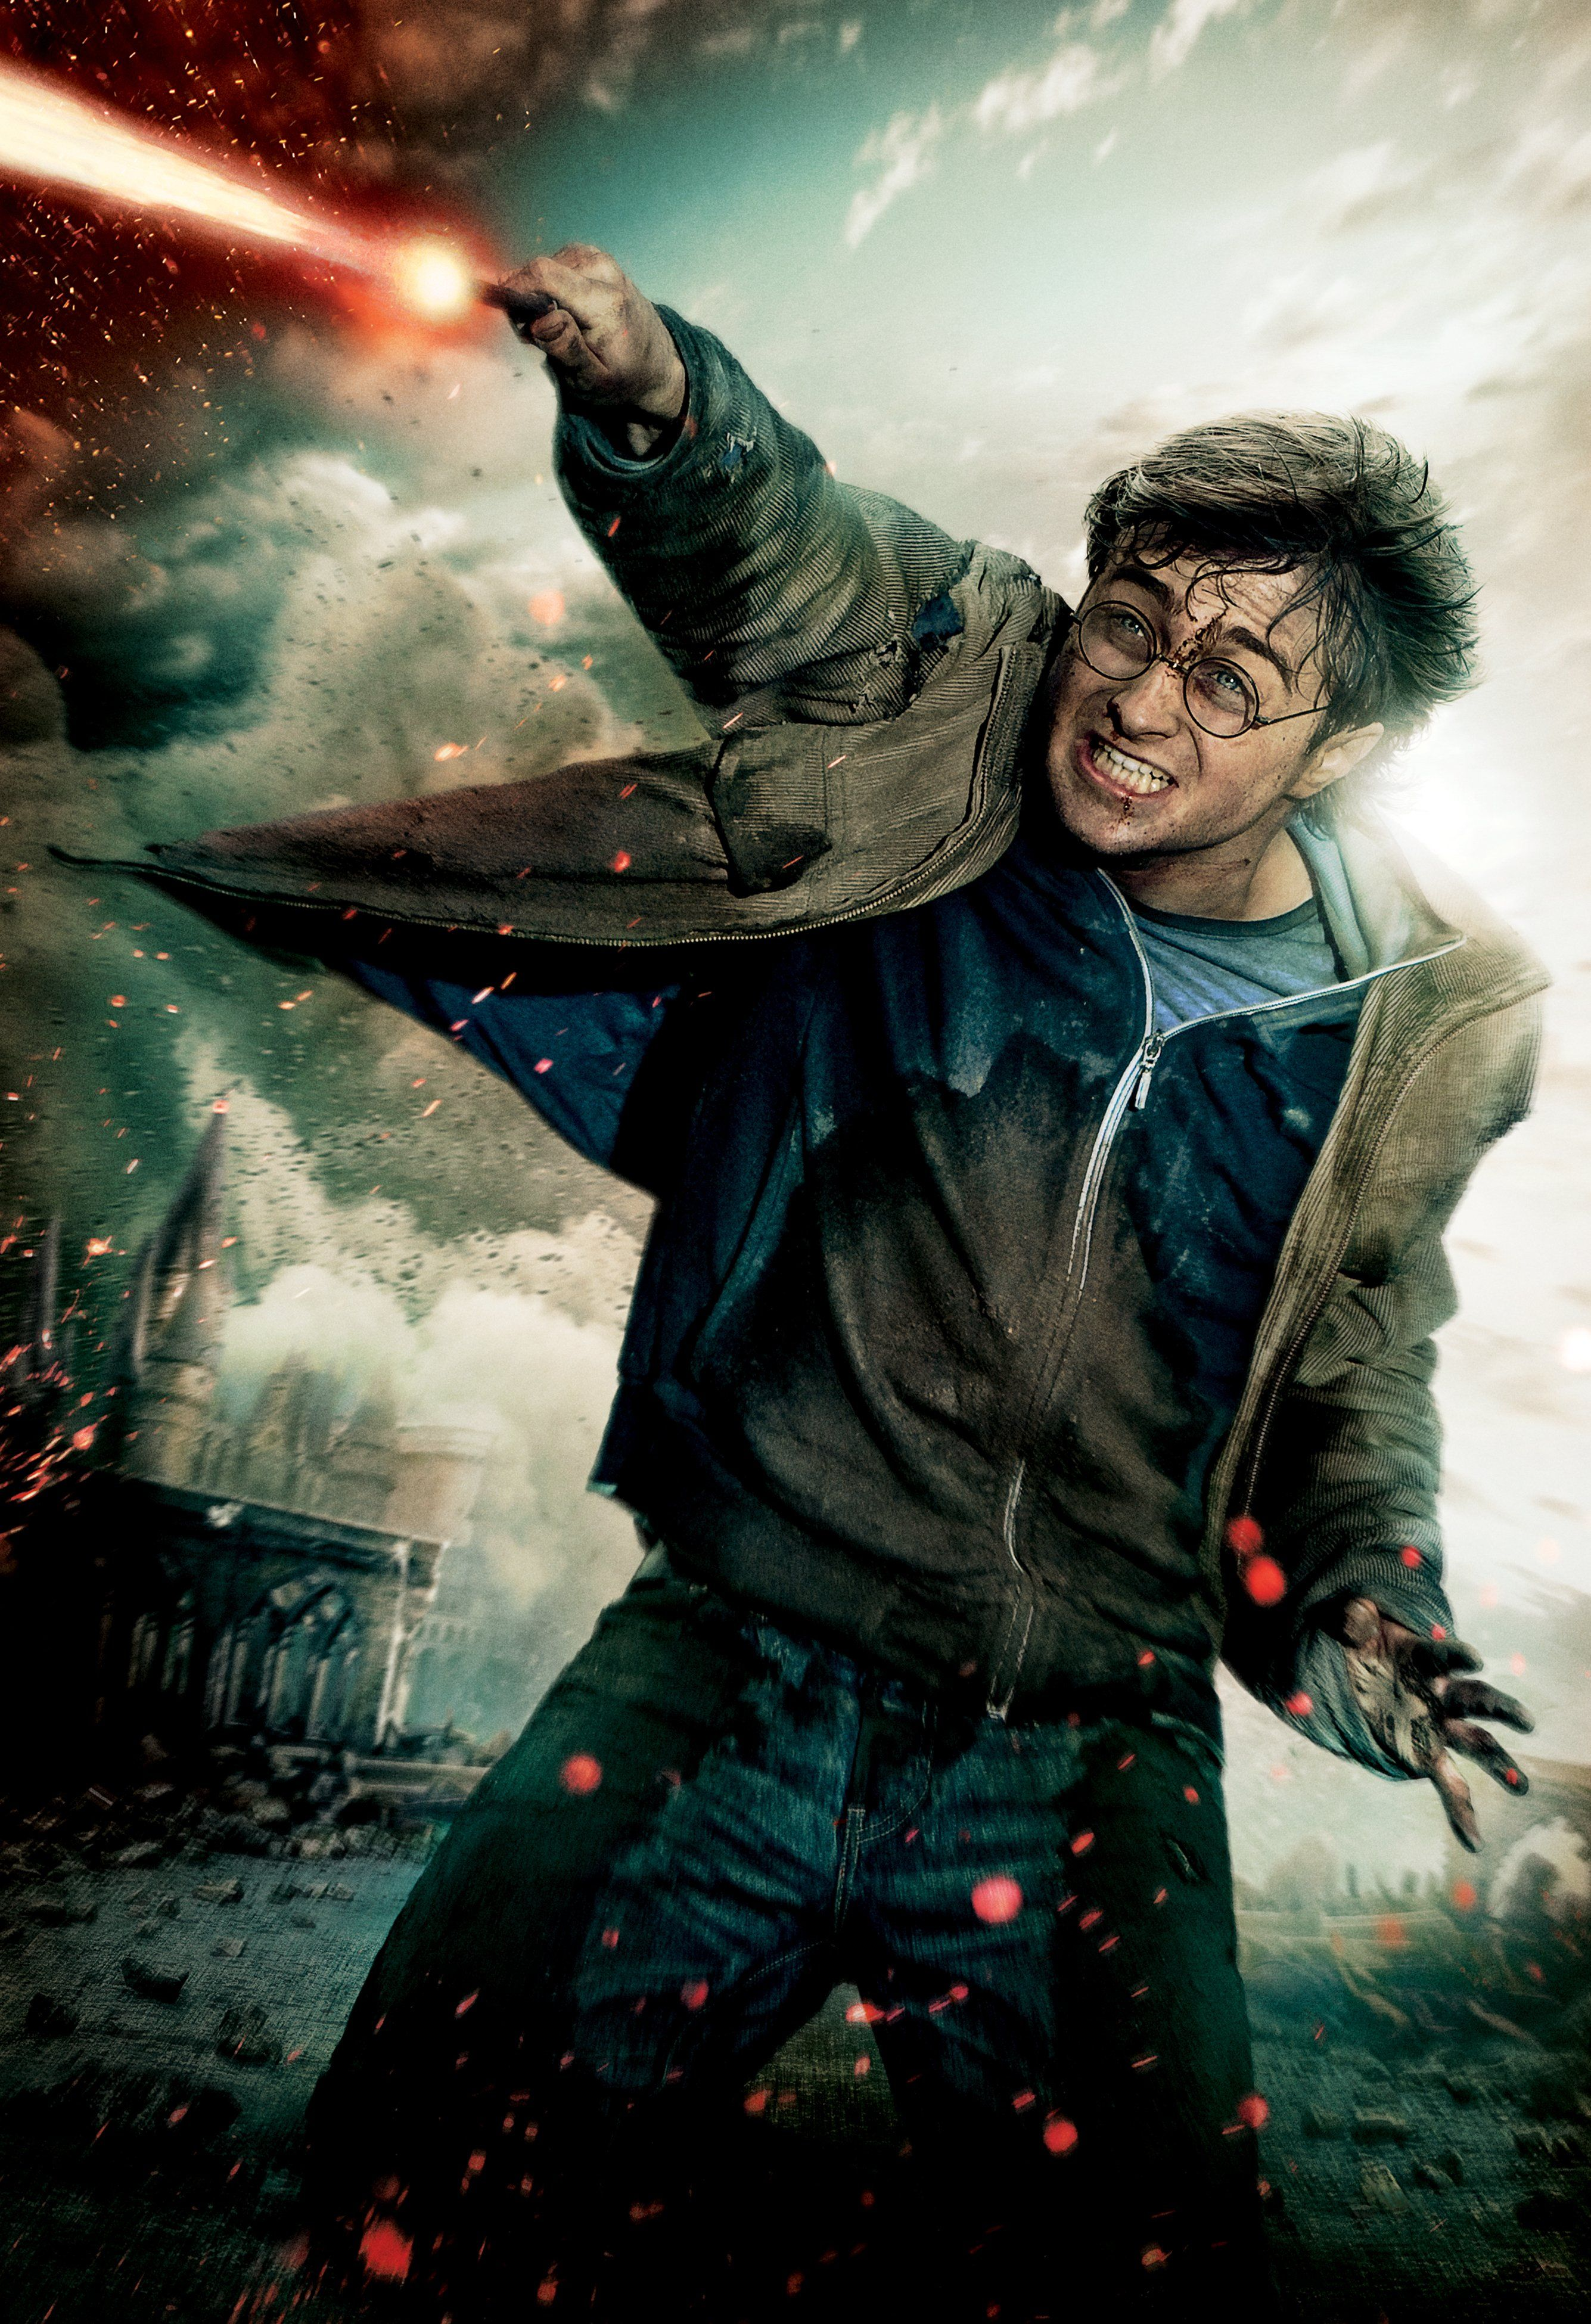 Harry Potter 7 Part 2 Harry Potter Film Poster Harry Potter Harry Potter